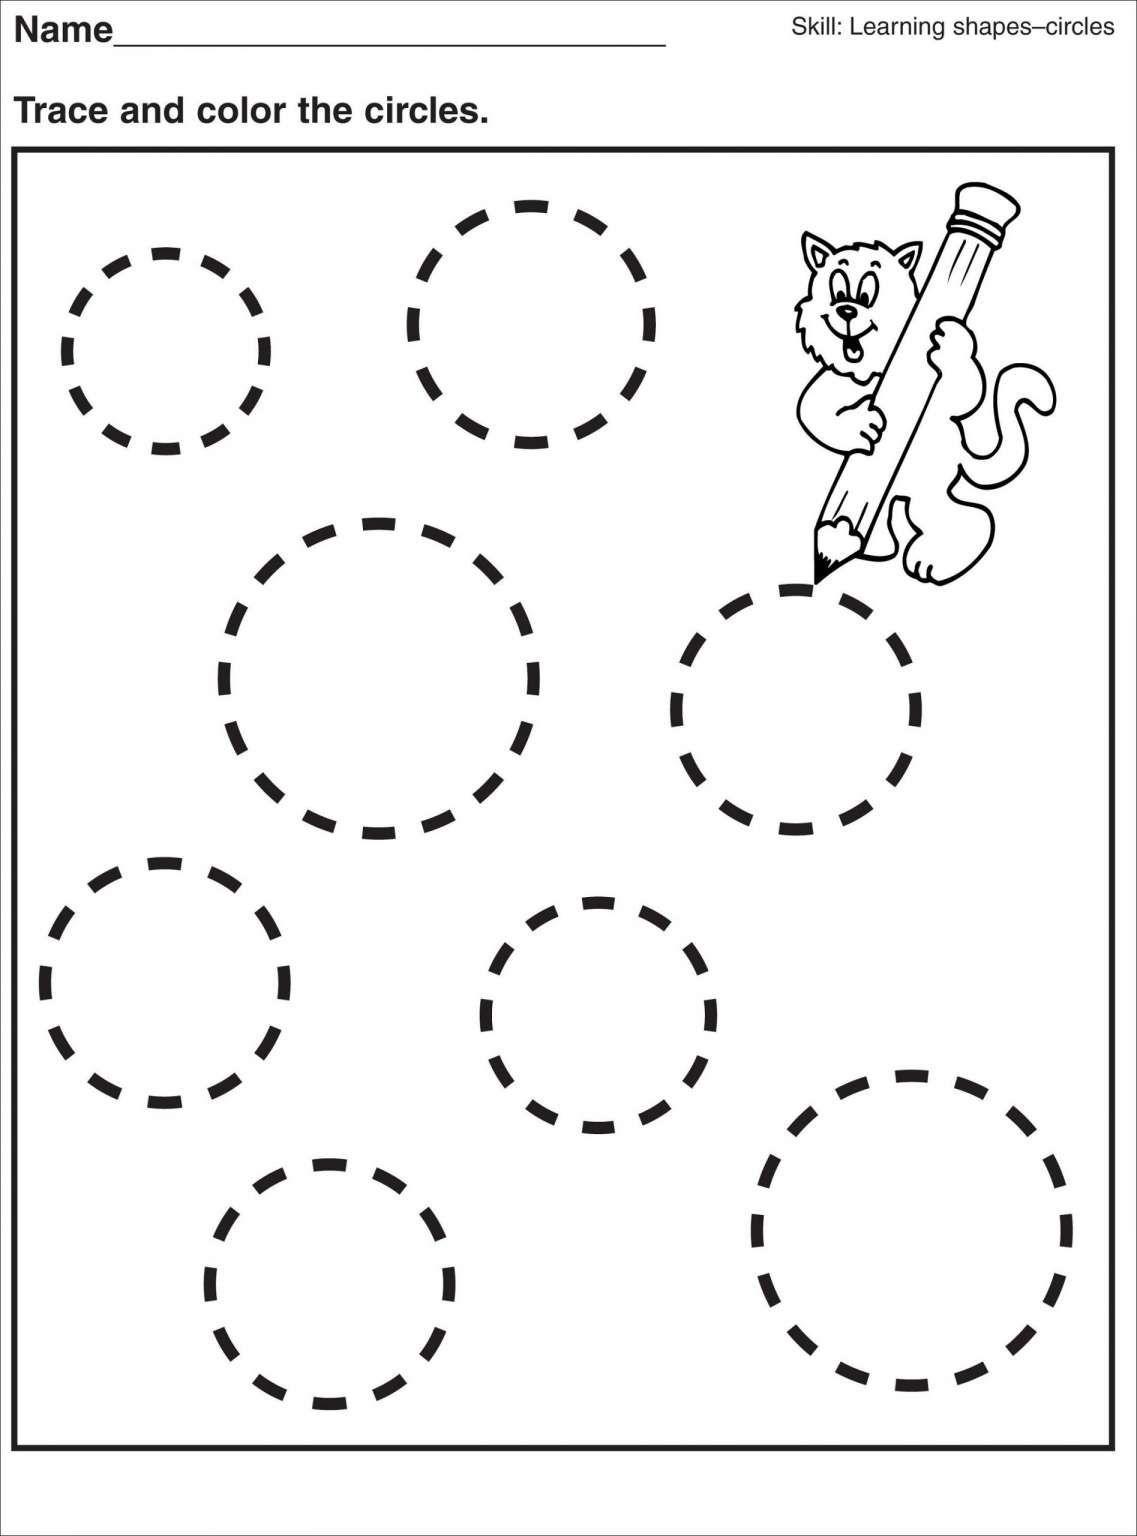 15 Shape Pattern Worksheet For Kindergarten